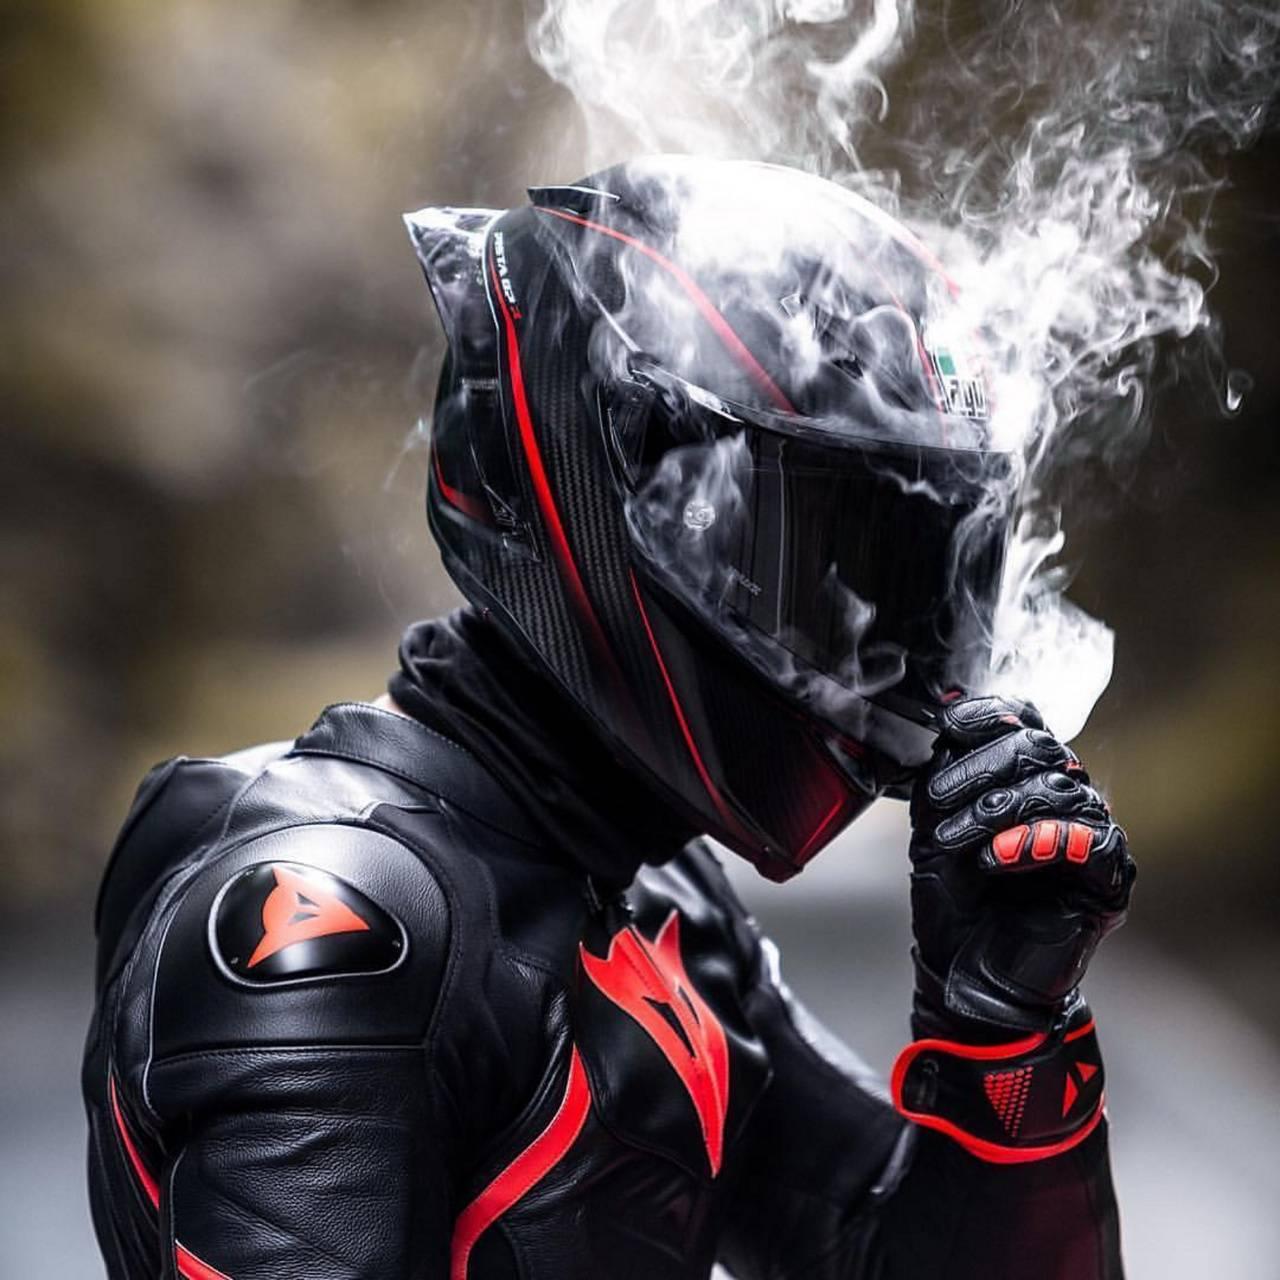 Biker smoker